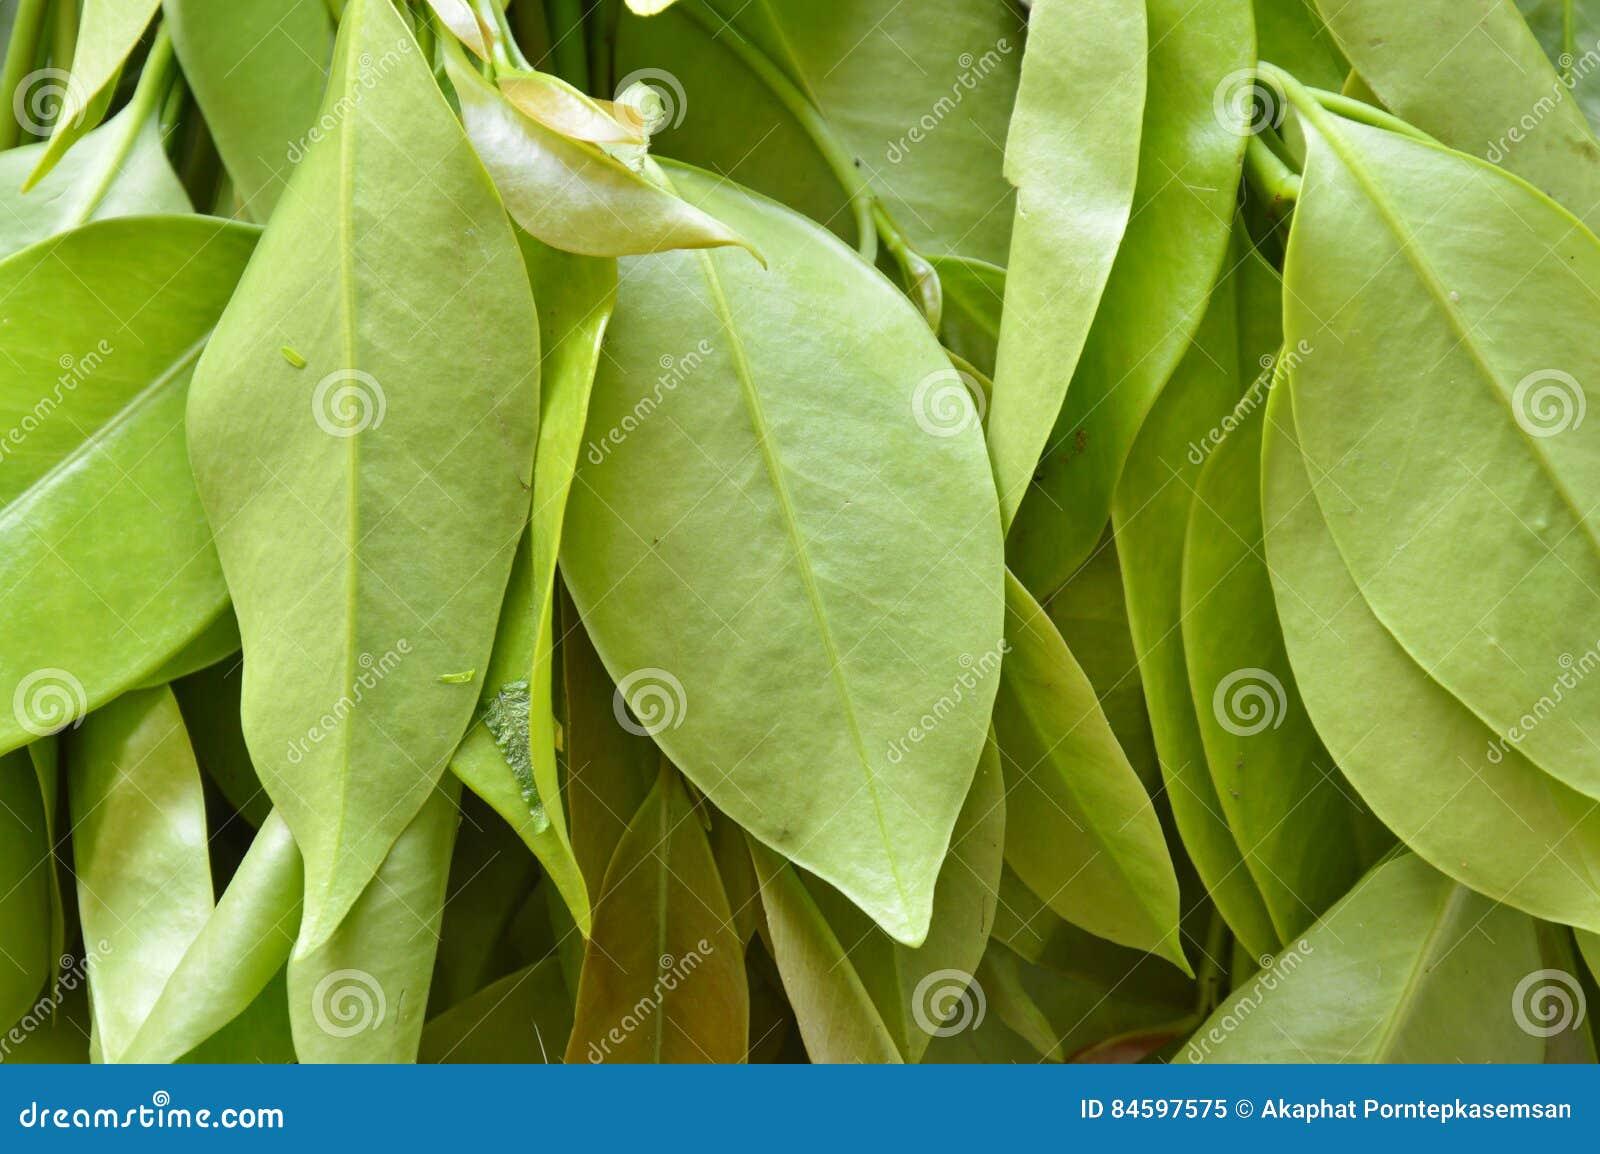 Garcinia cowa tropical herb taste sour and unique scent